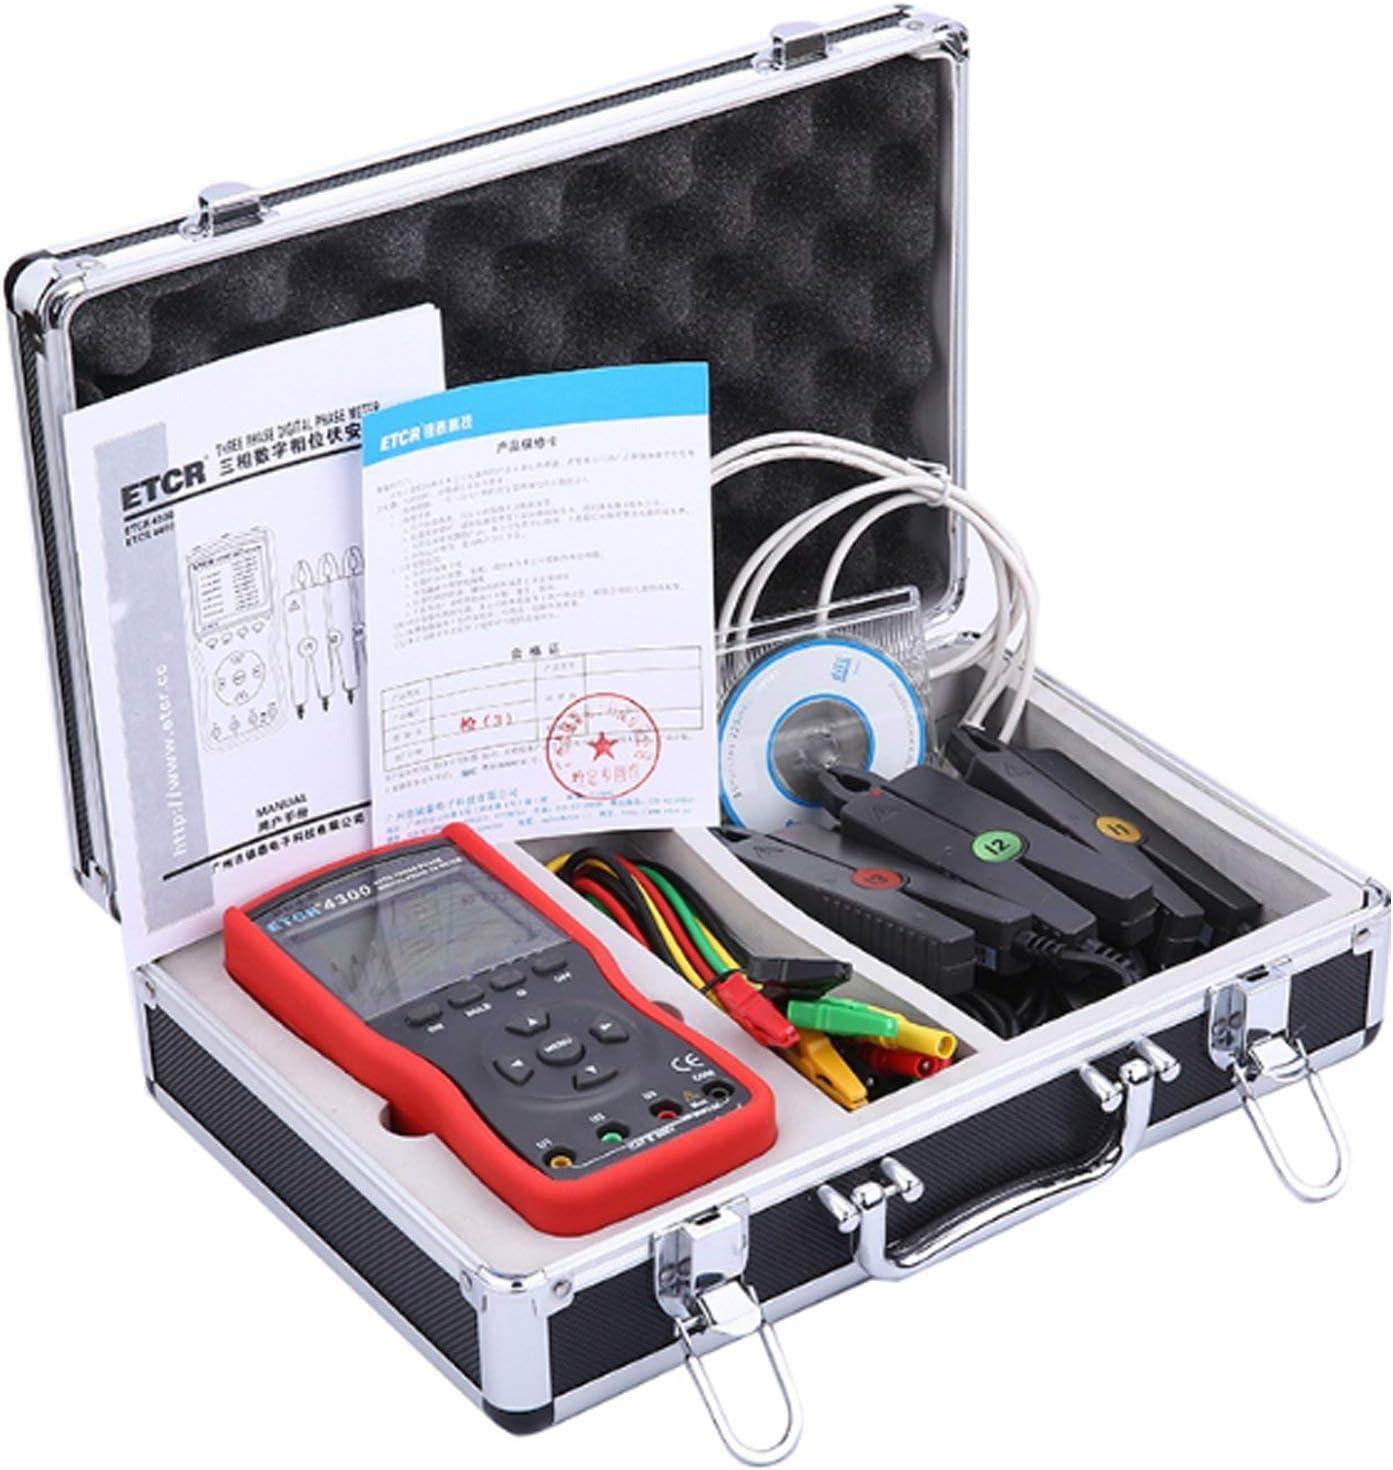 WXQ-XQ Portable Scientific Small tip current clamp Three Phase Meter Digital Volt-ampere Meter AC voltage current tester detector ETCR4300 Digital Clamp Meter